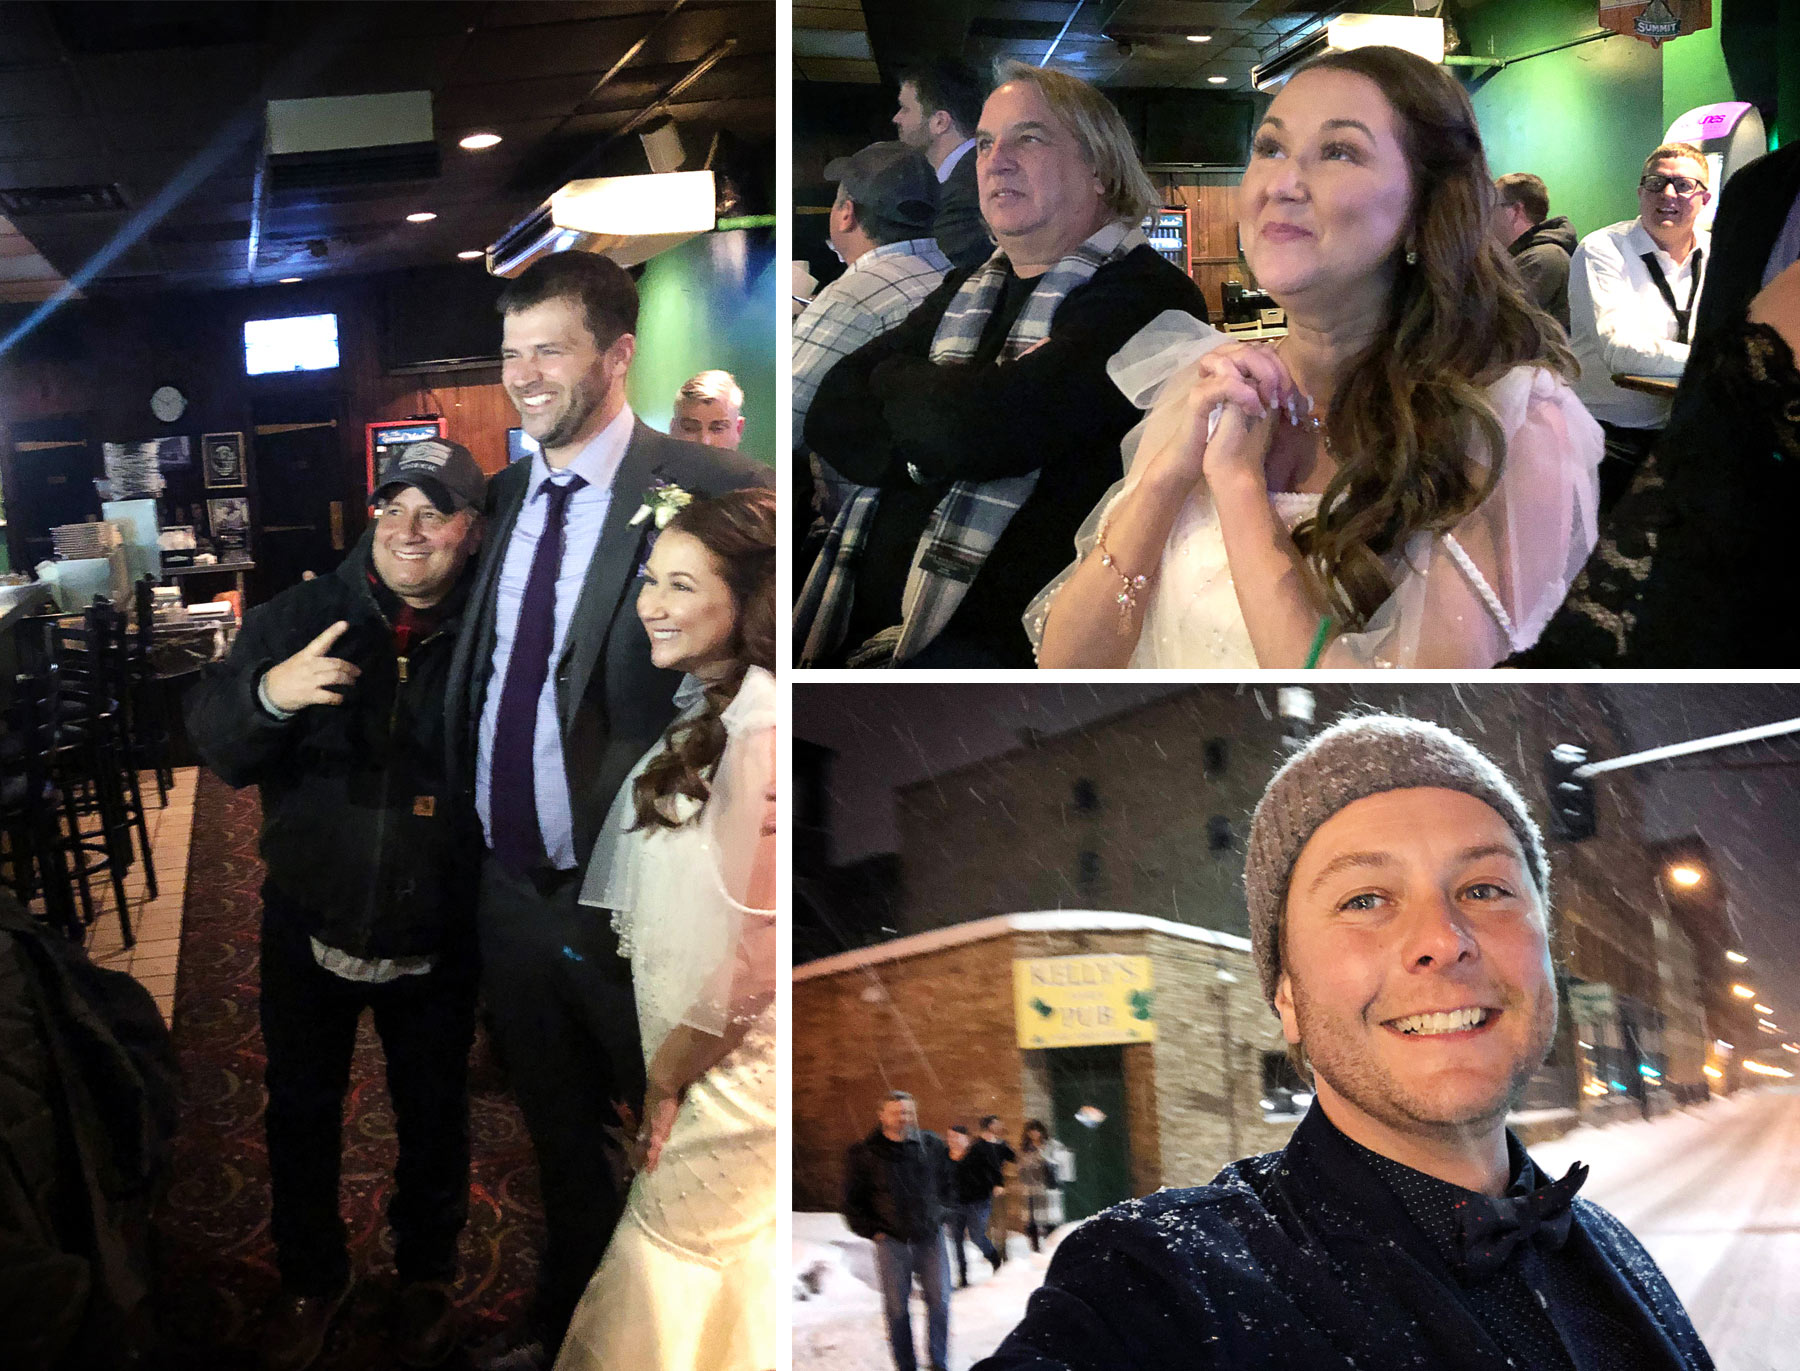 16-Andrew-Vick-Photography-My-Great-Big-Live-Wedding-with-David-Tutera-Behind-the-Scenes-Minnesota-Saint-Paul-Kellys-Pub-Snow.jpg